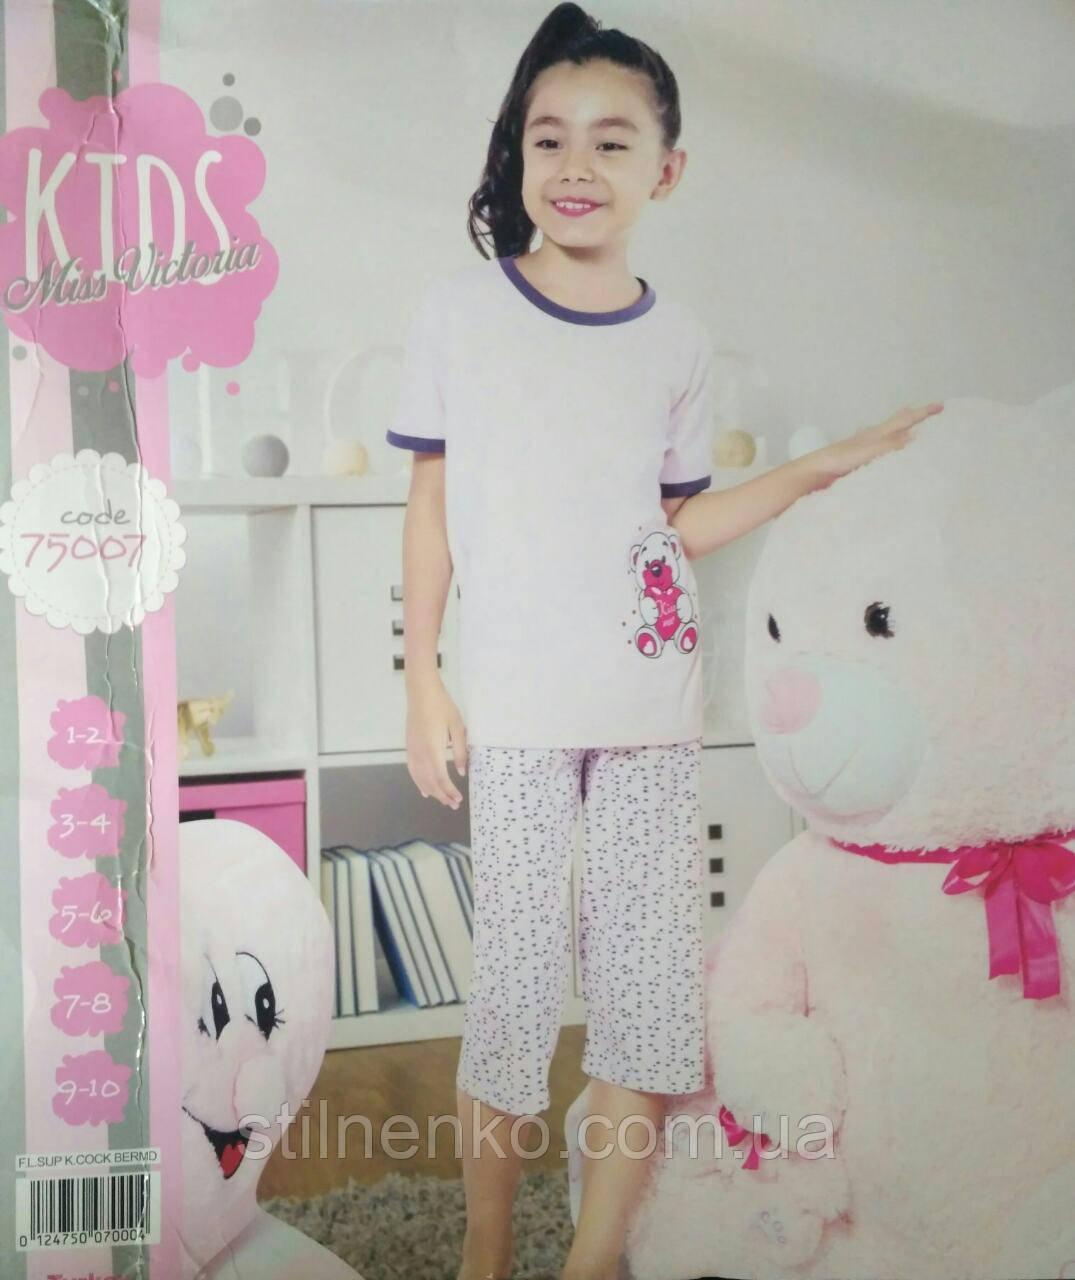 Пижама детская бриджи+футболка KIDS Miss Victoria